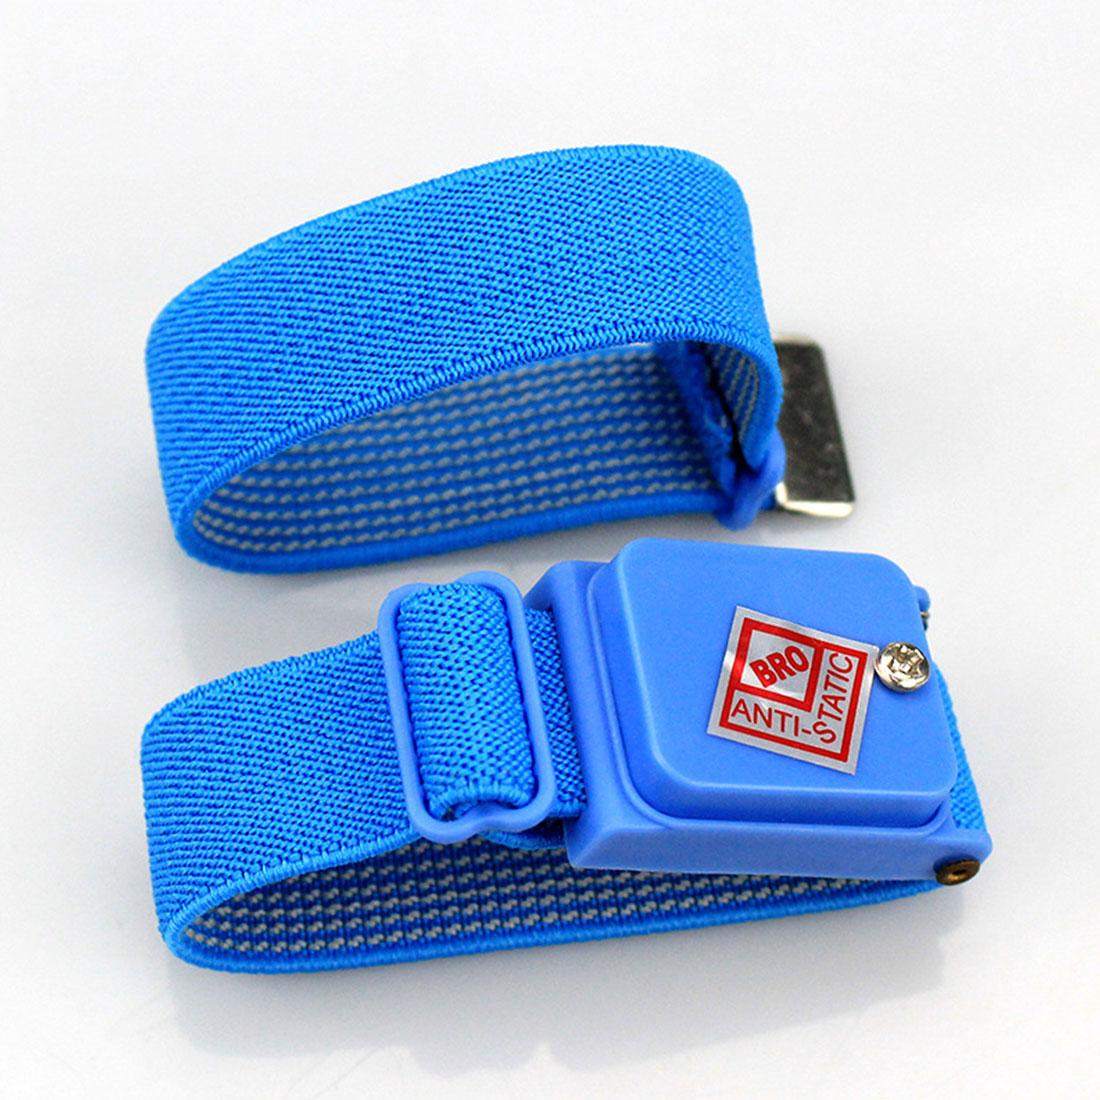 Hot ESD Anti Static Cordless Wrist Strap Elastic Band For Sensitive Electronics Repair Tools